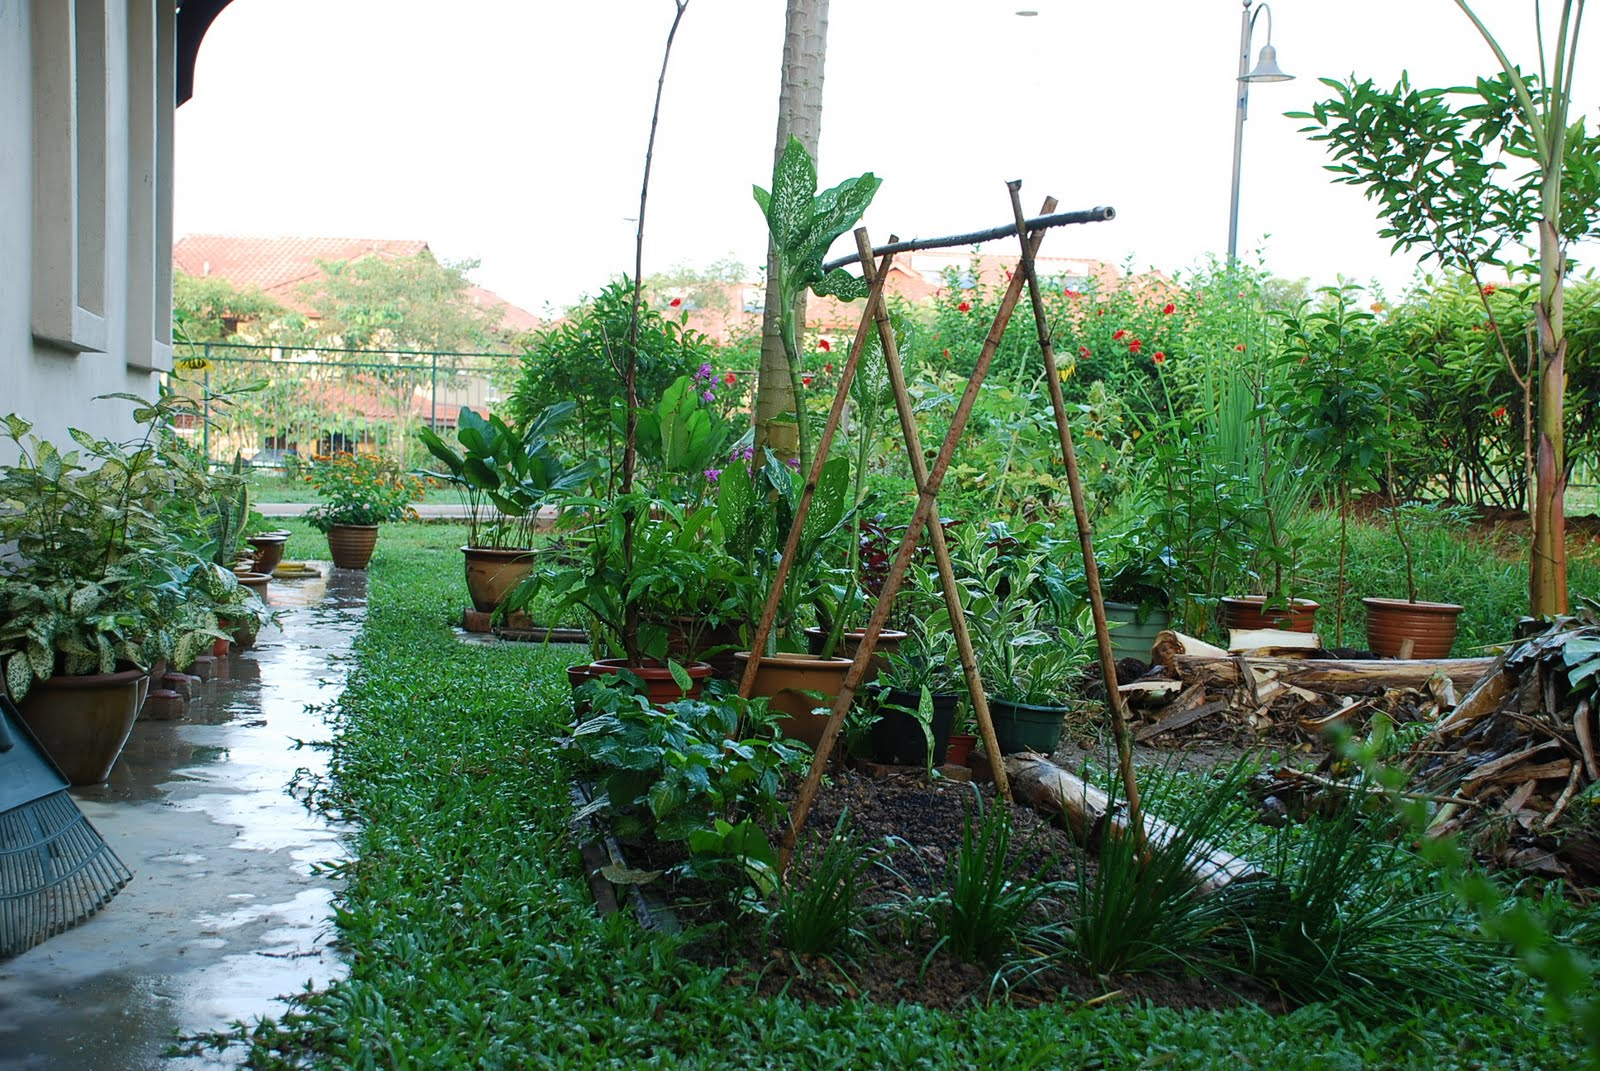 My little vegetable garden Cucumber on beds and trellis